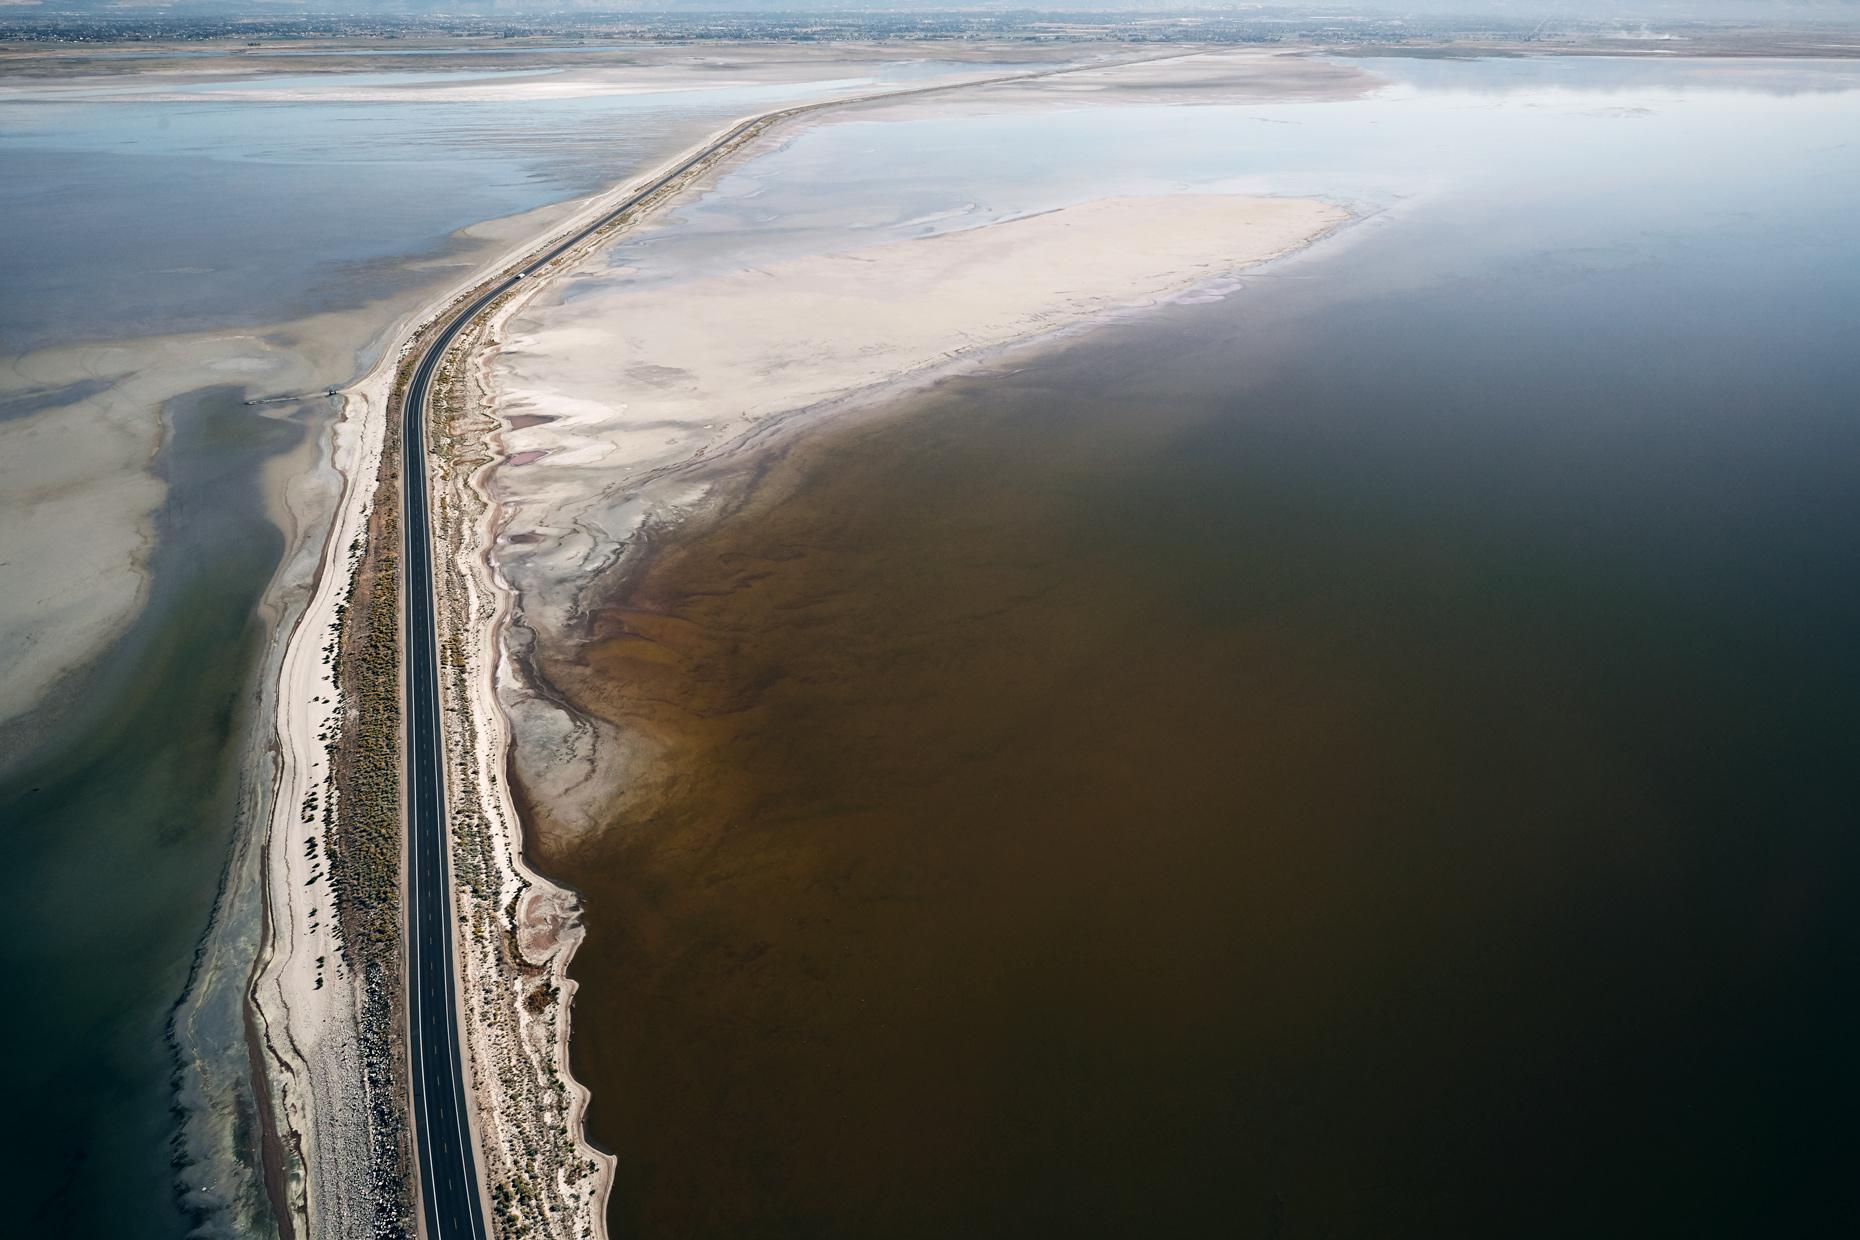 Aerial Photography Derek Israelsen The Great Salt Lake Divide